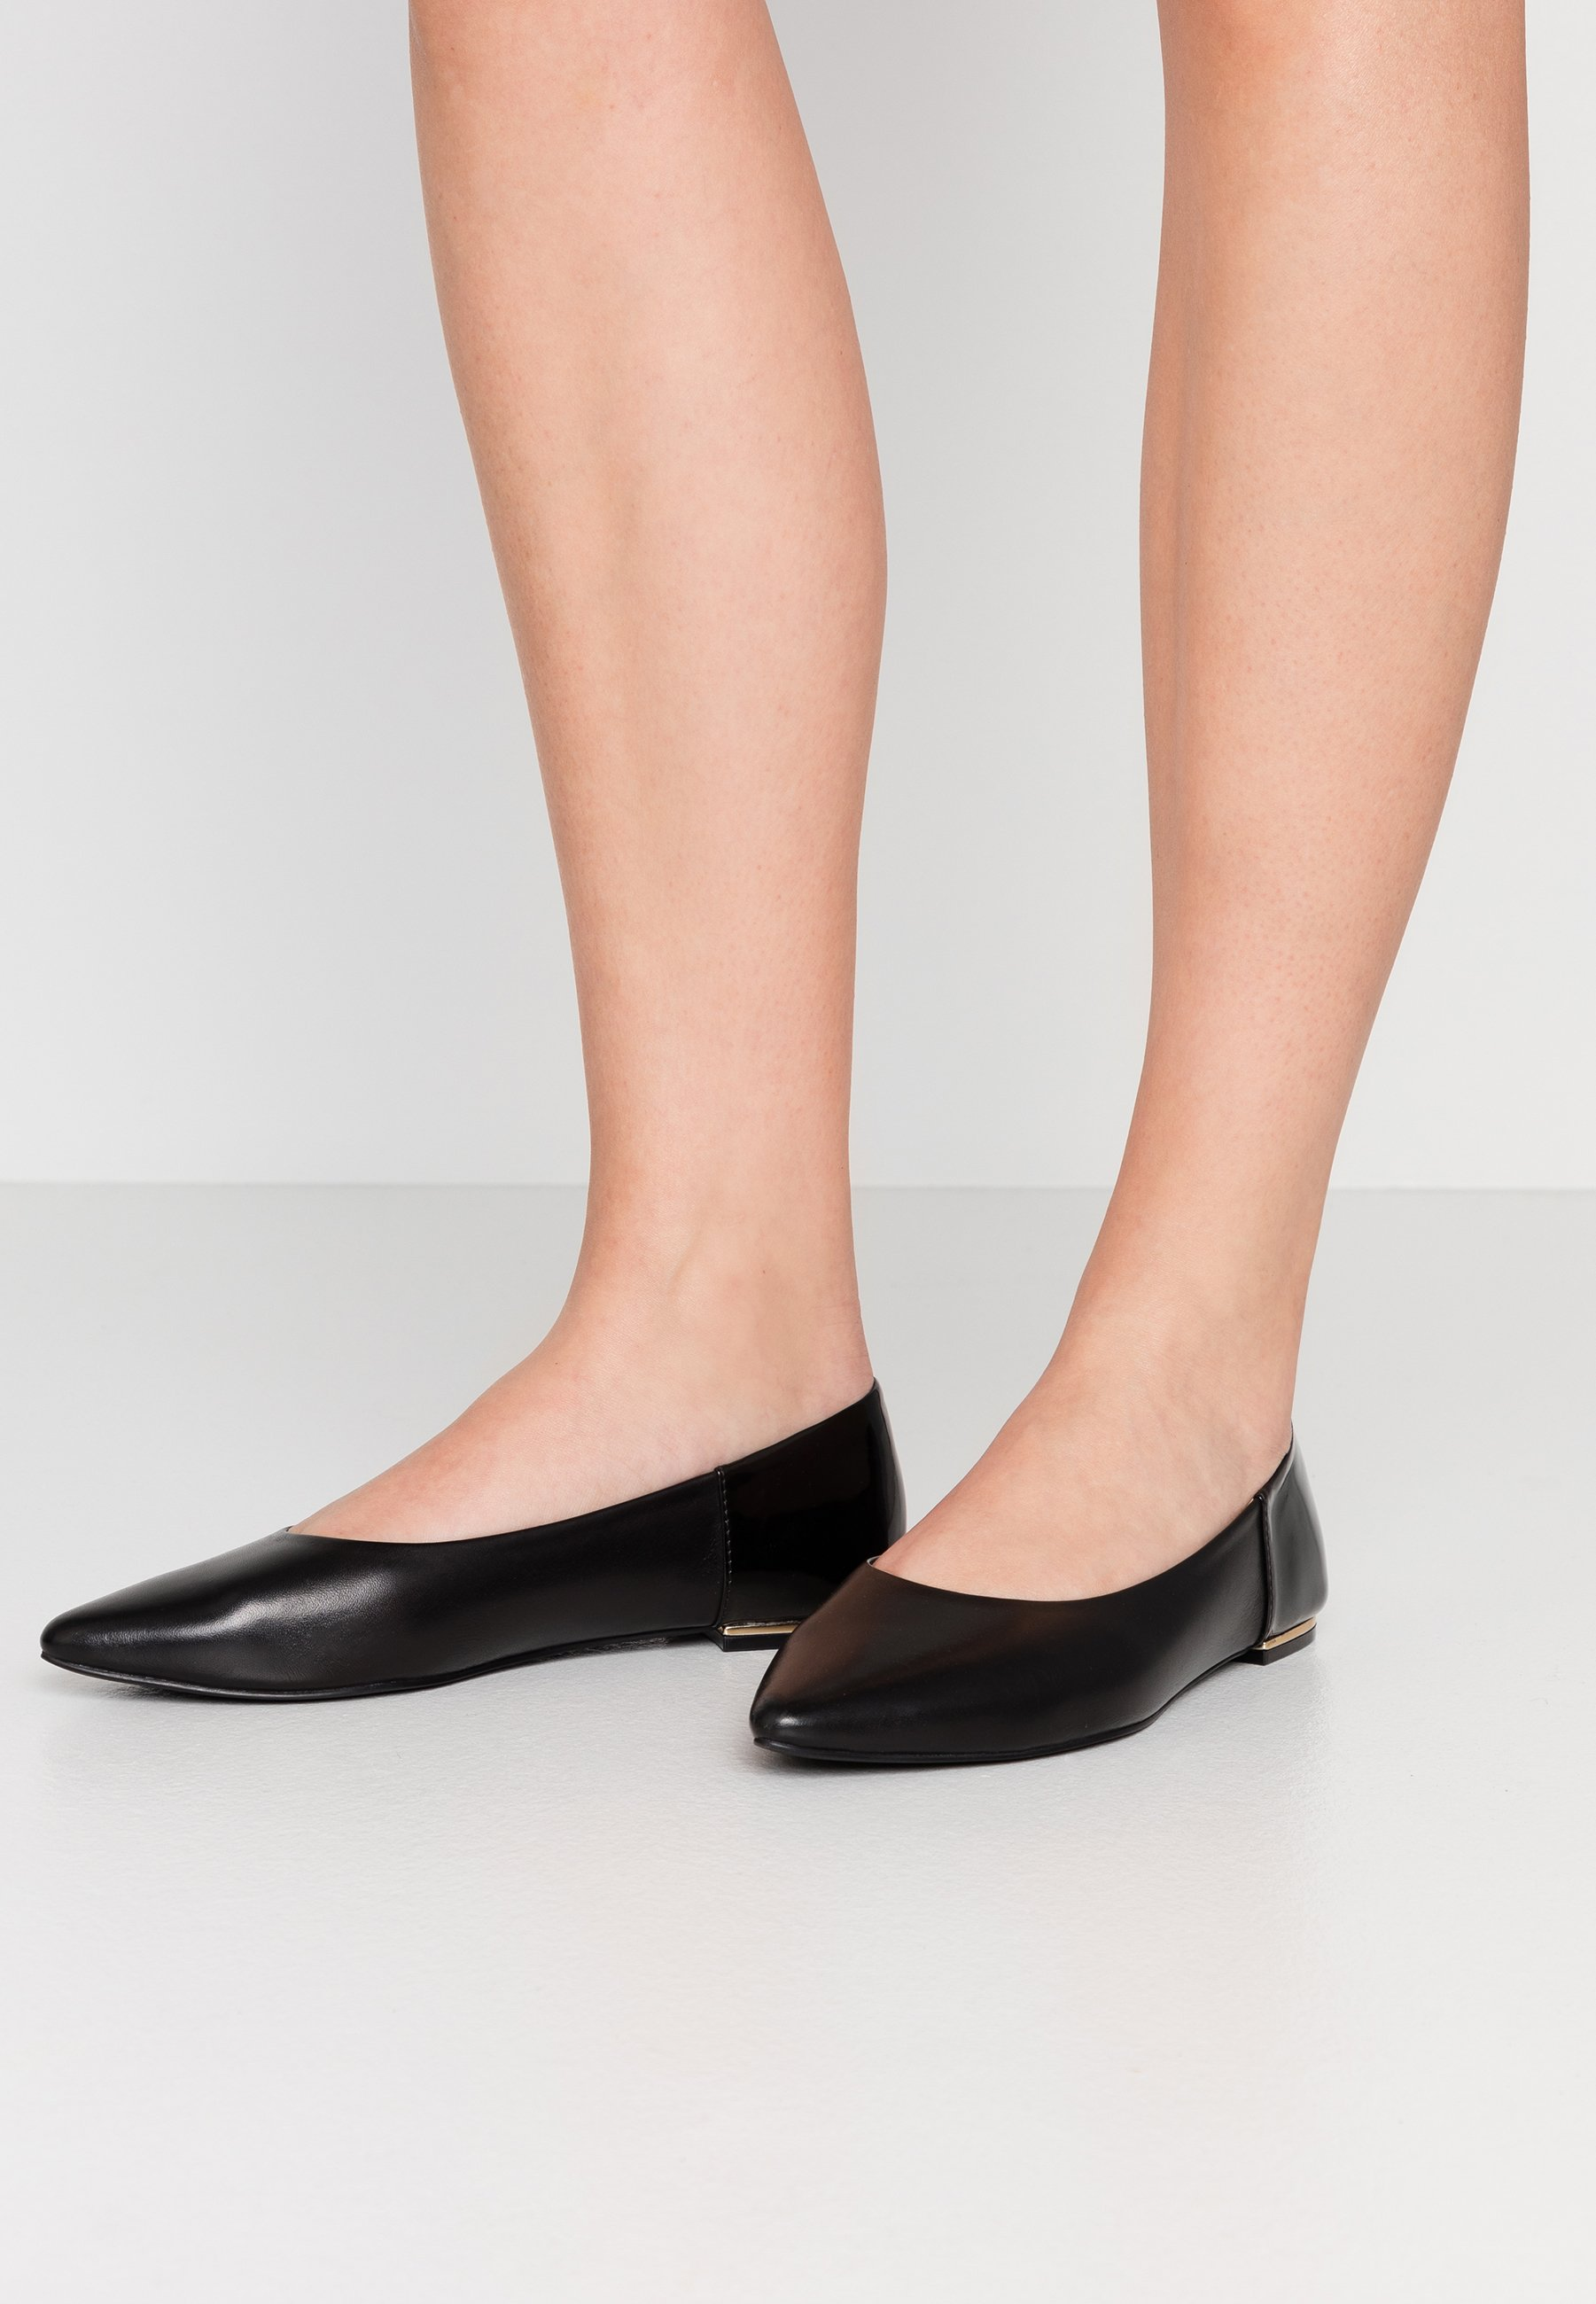 Anna Field LEATHER BALLERINA  - Ballerine - black - Scarpe da donna Caldo